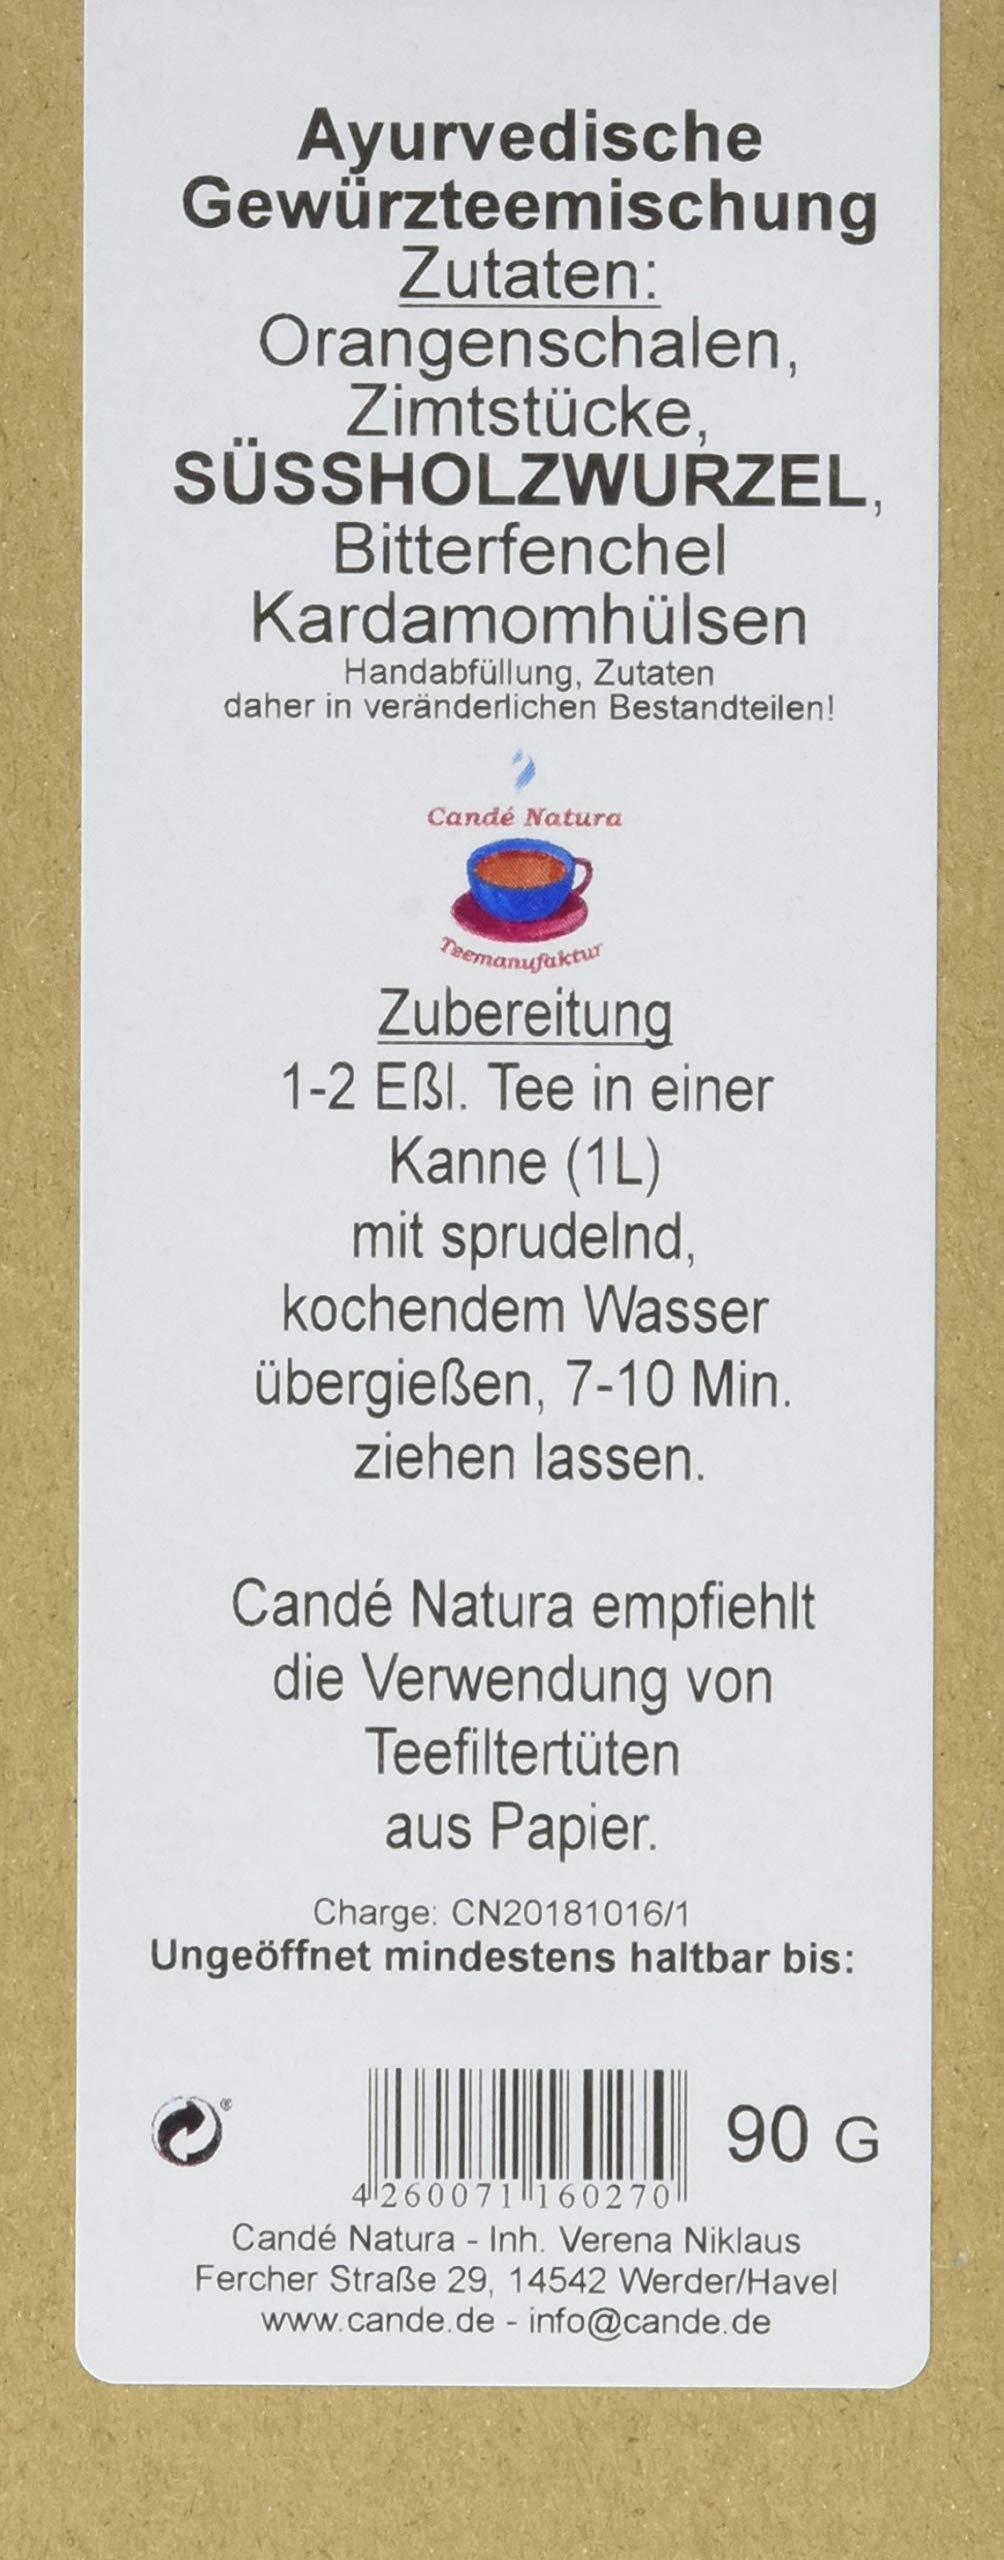 Cand-Natura-Teemanufaktur-Anti-Stress-Ayrvedische-Teemischung-5er-Pack-5-x-90-g